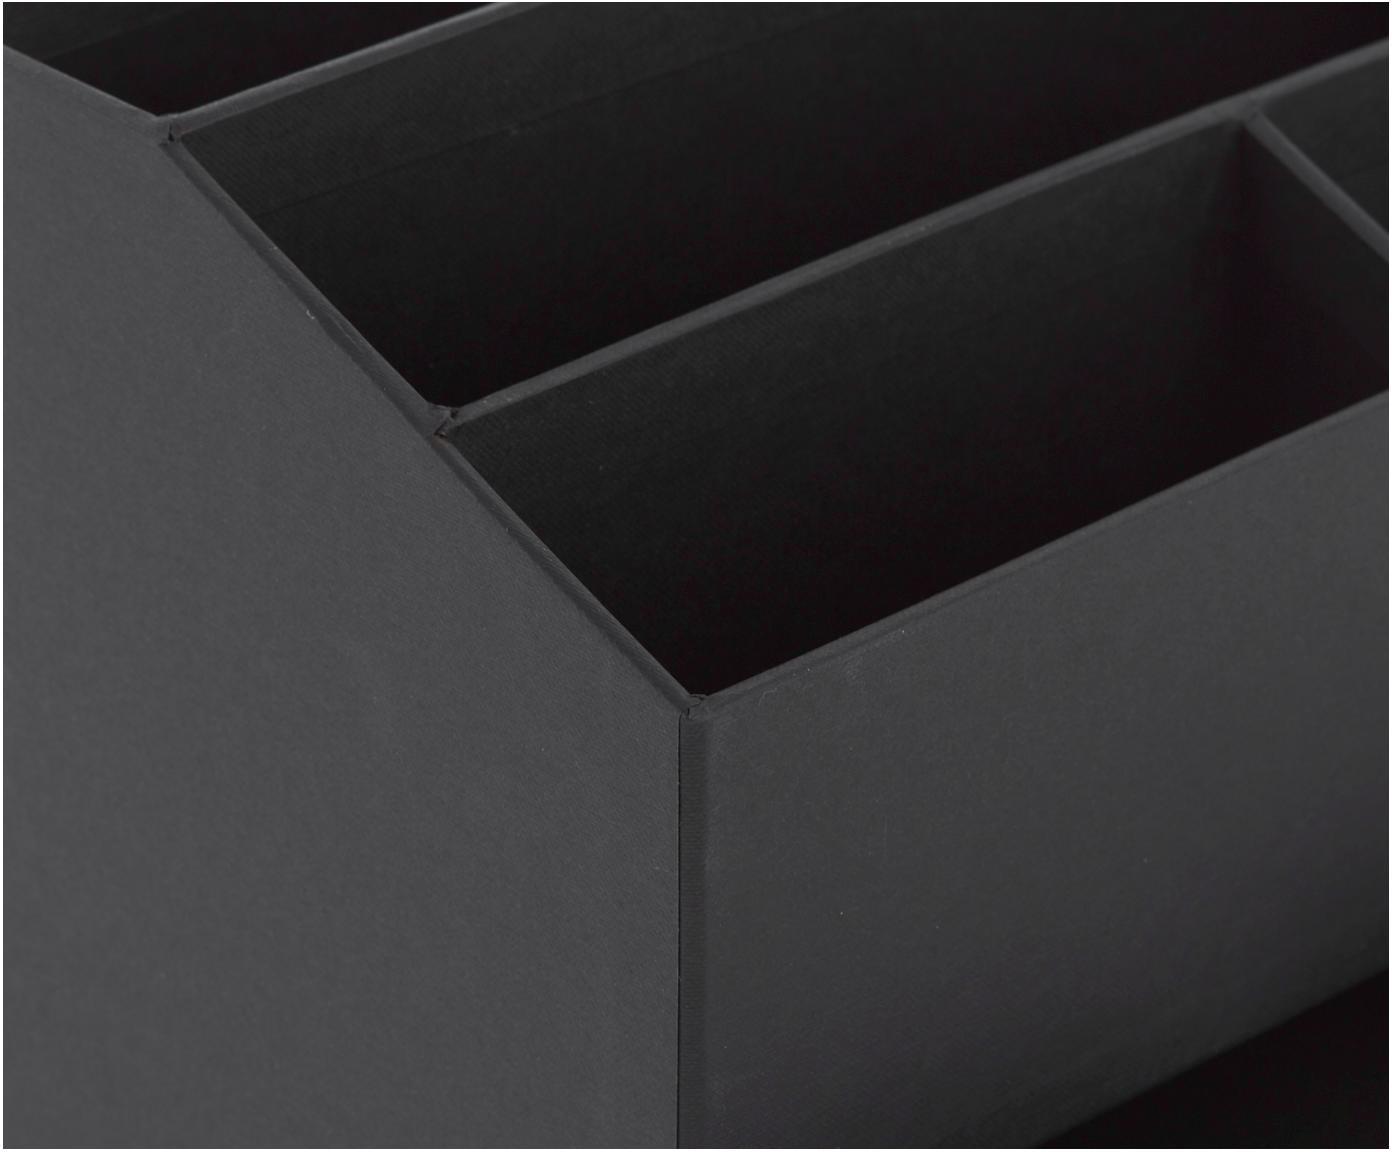 Bureau organizer Greta, Massief, gelamineerd karton, Zwart, 24 x 18 cm